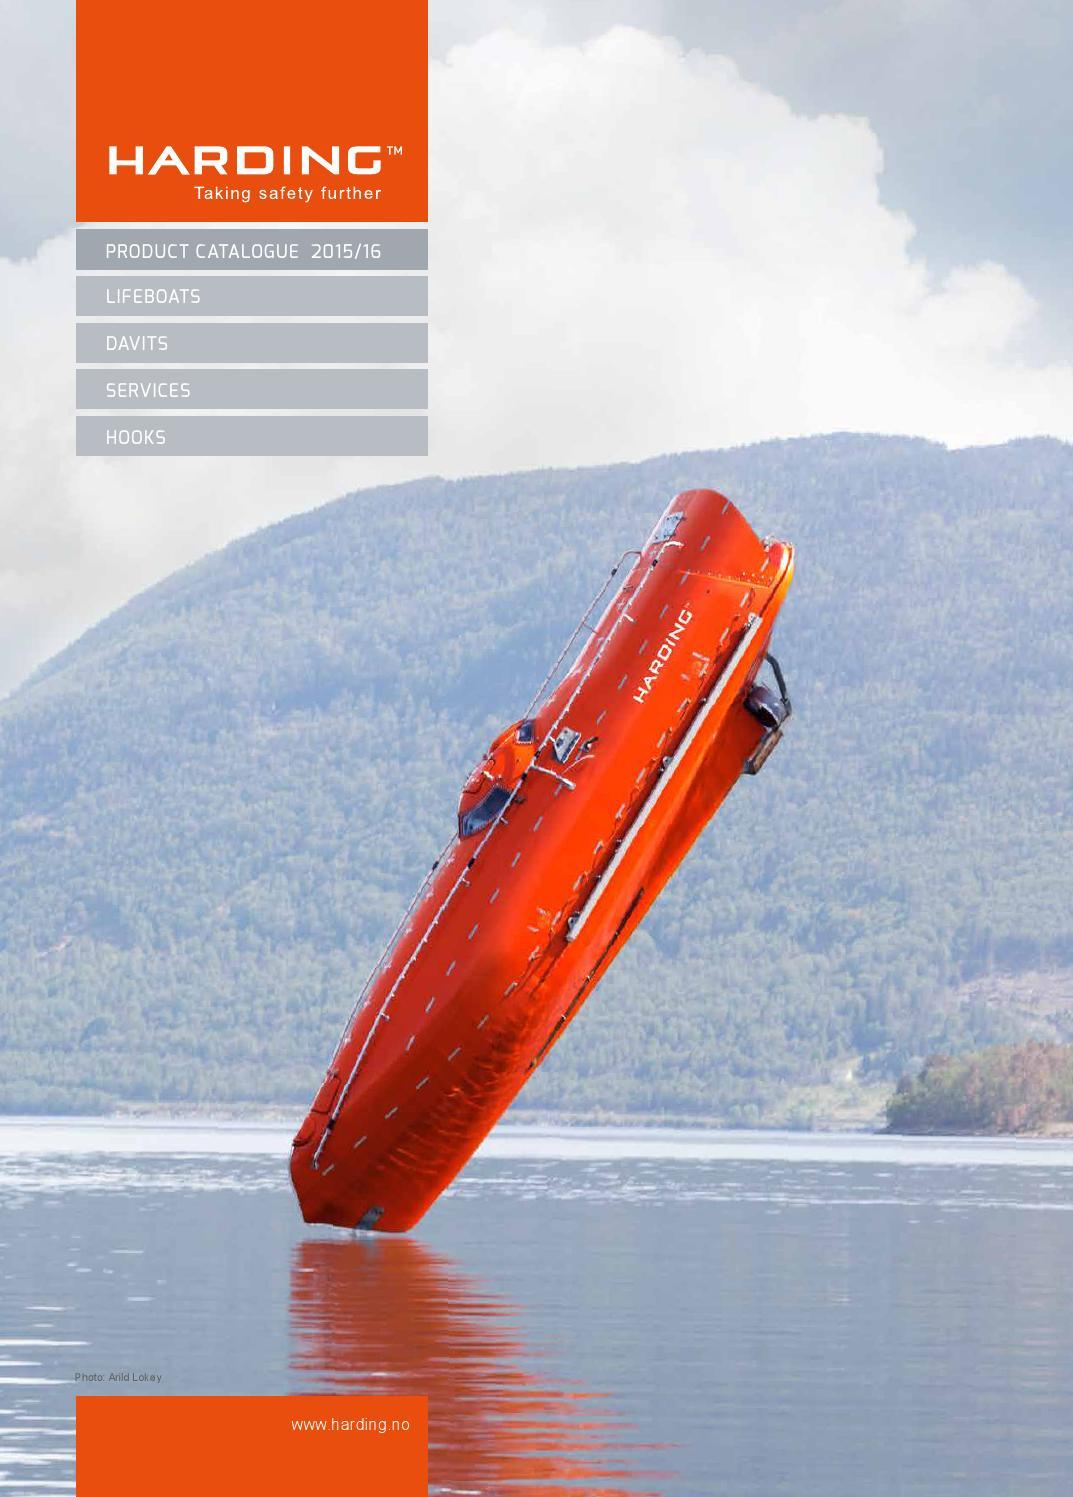 Harding Product Catalogue 2015 By Zpirit Reklamebyr 229 Issuu